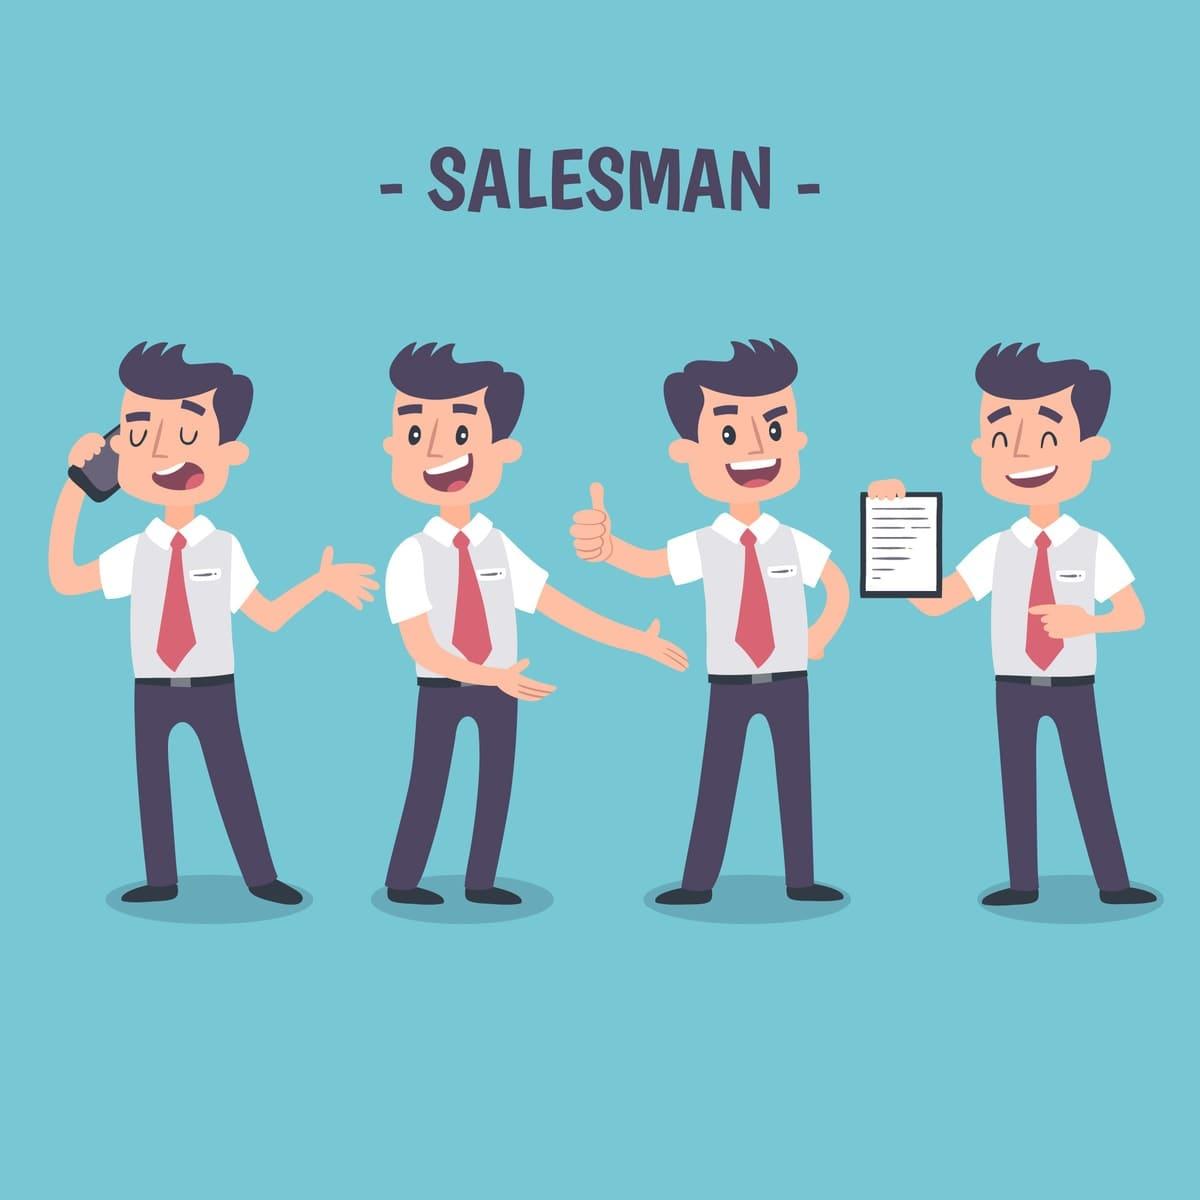 Salesman dan Salesmanship